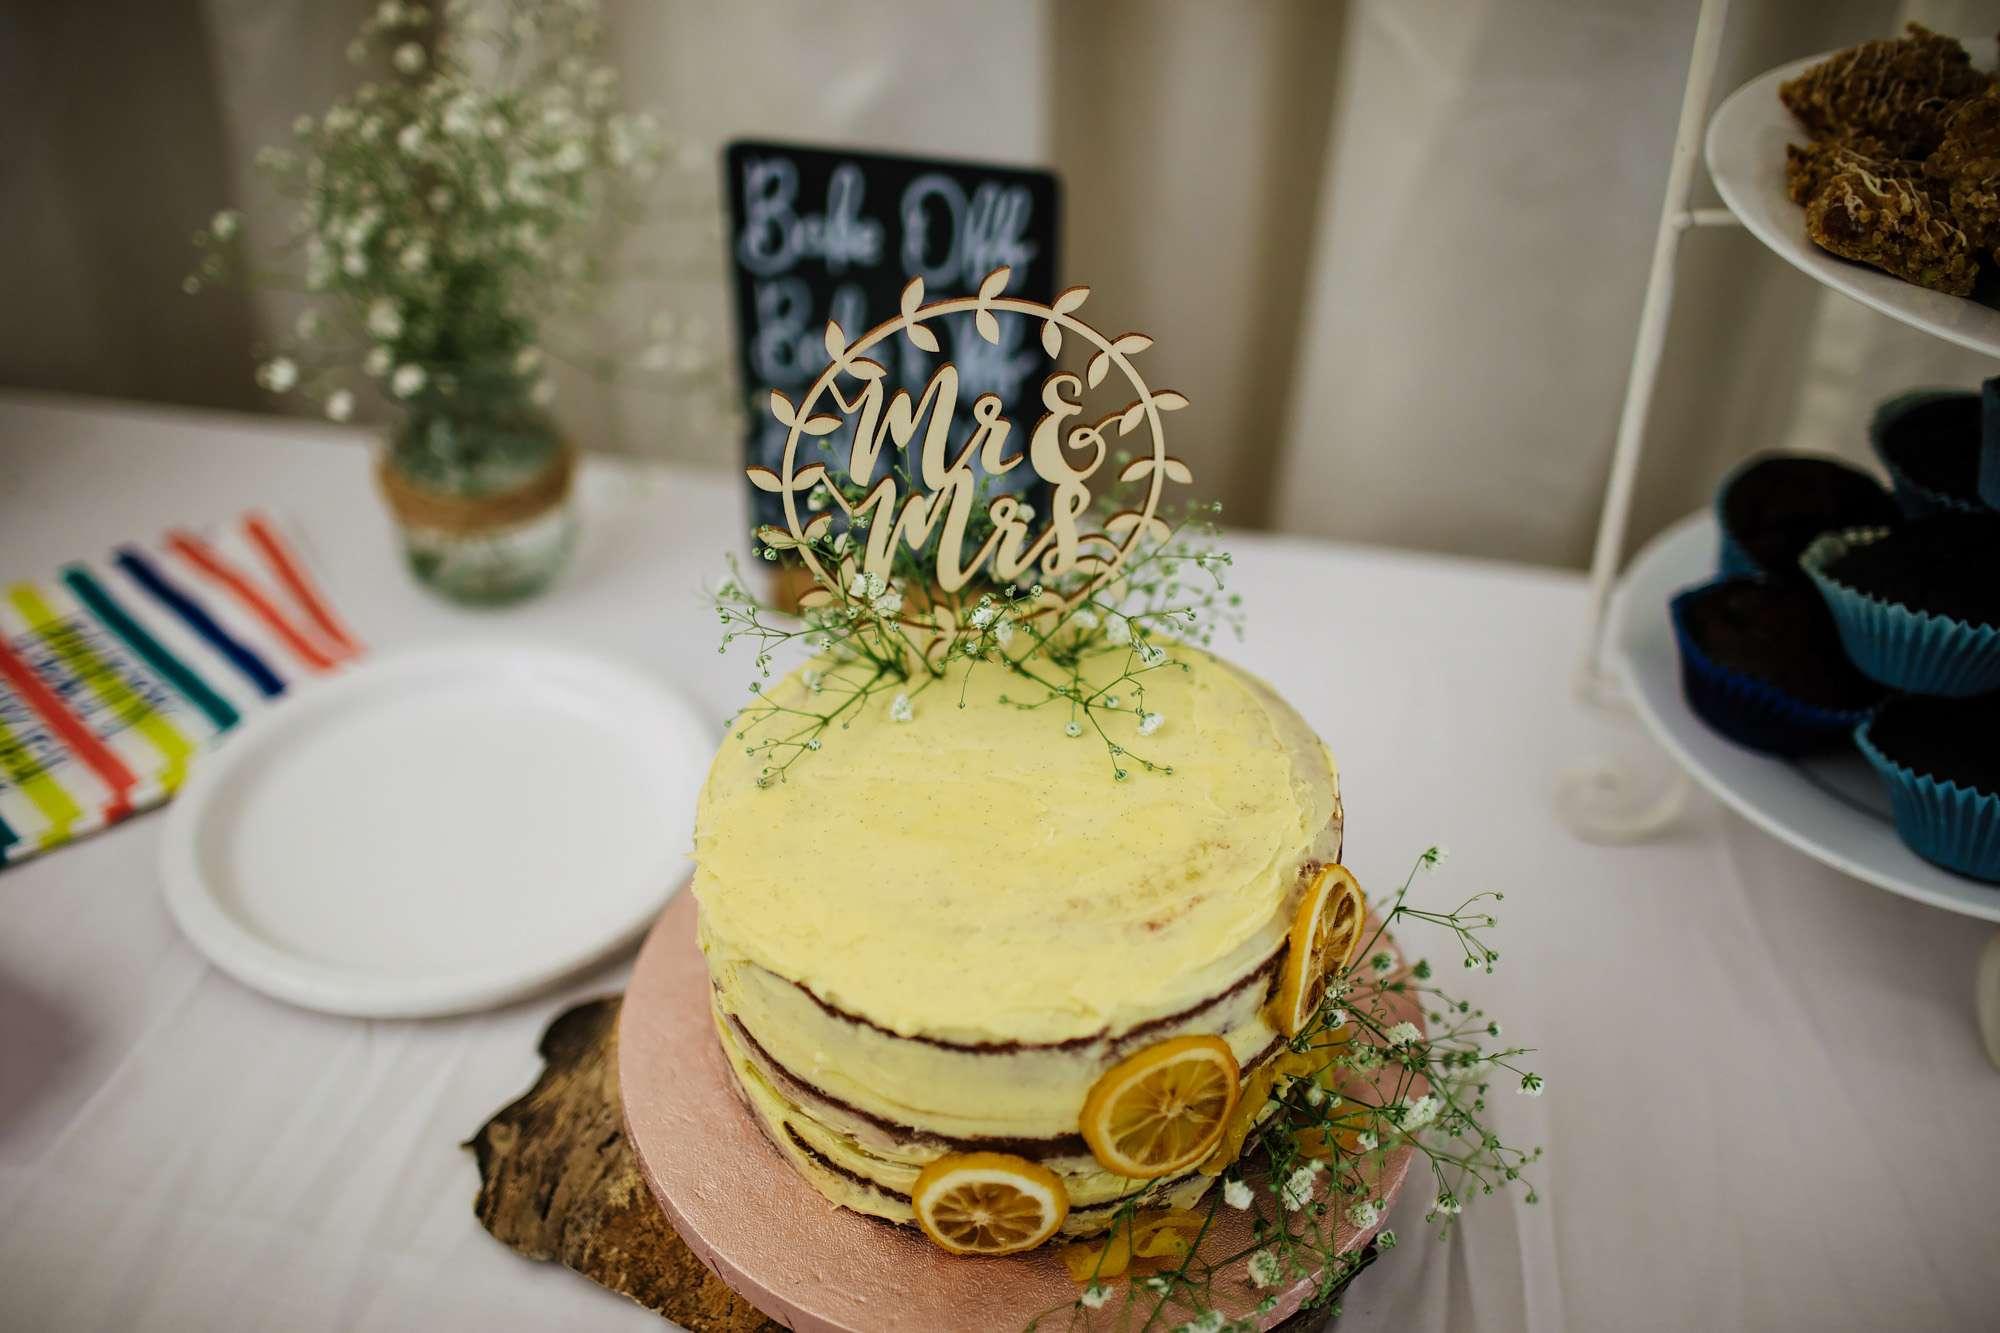 Wedding cake at a bake off themed wedding